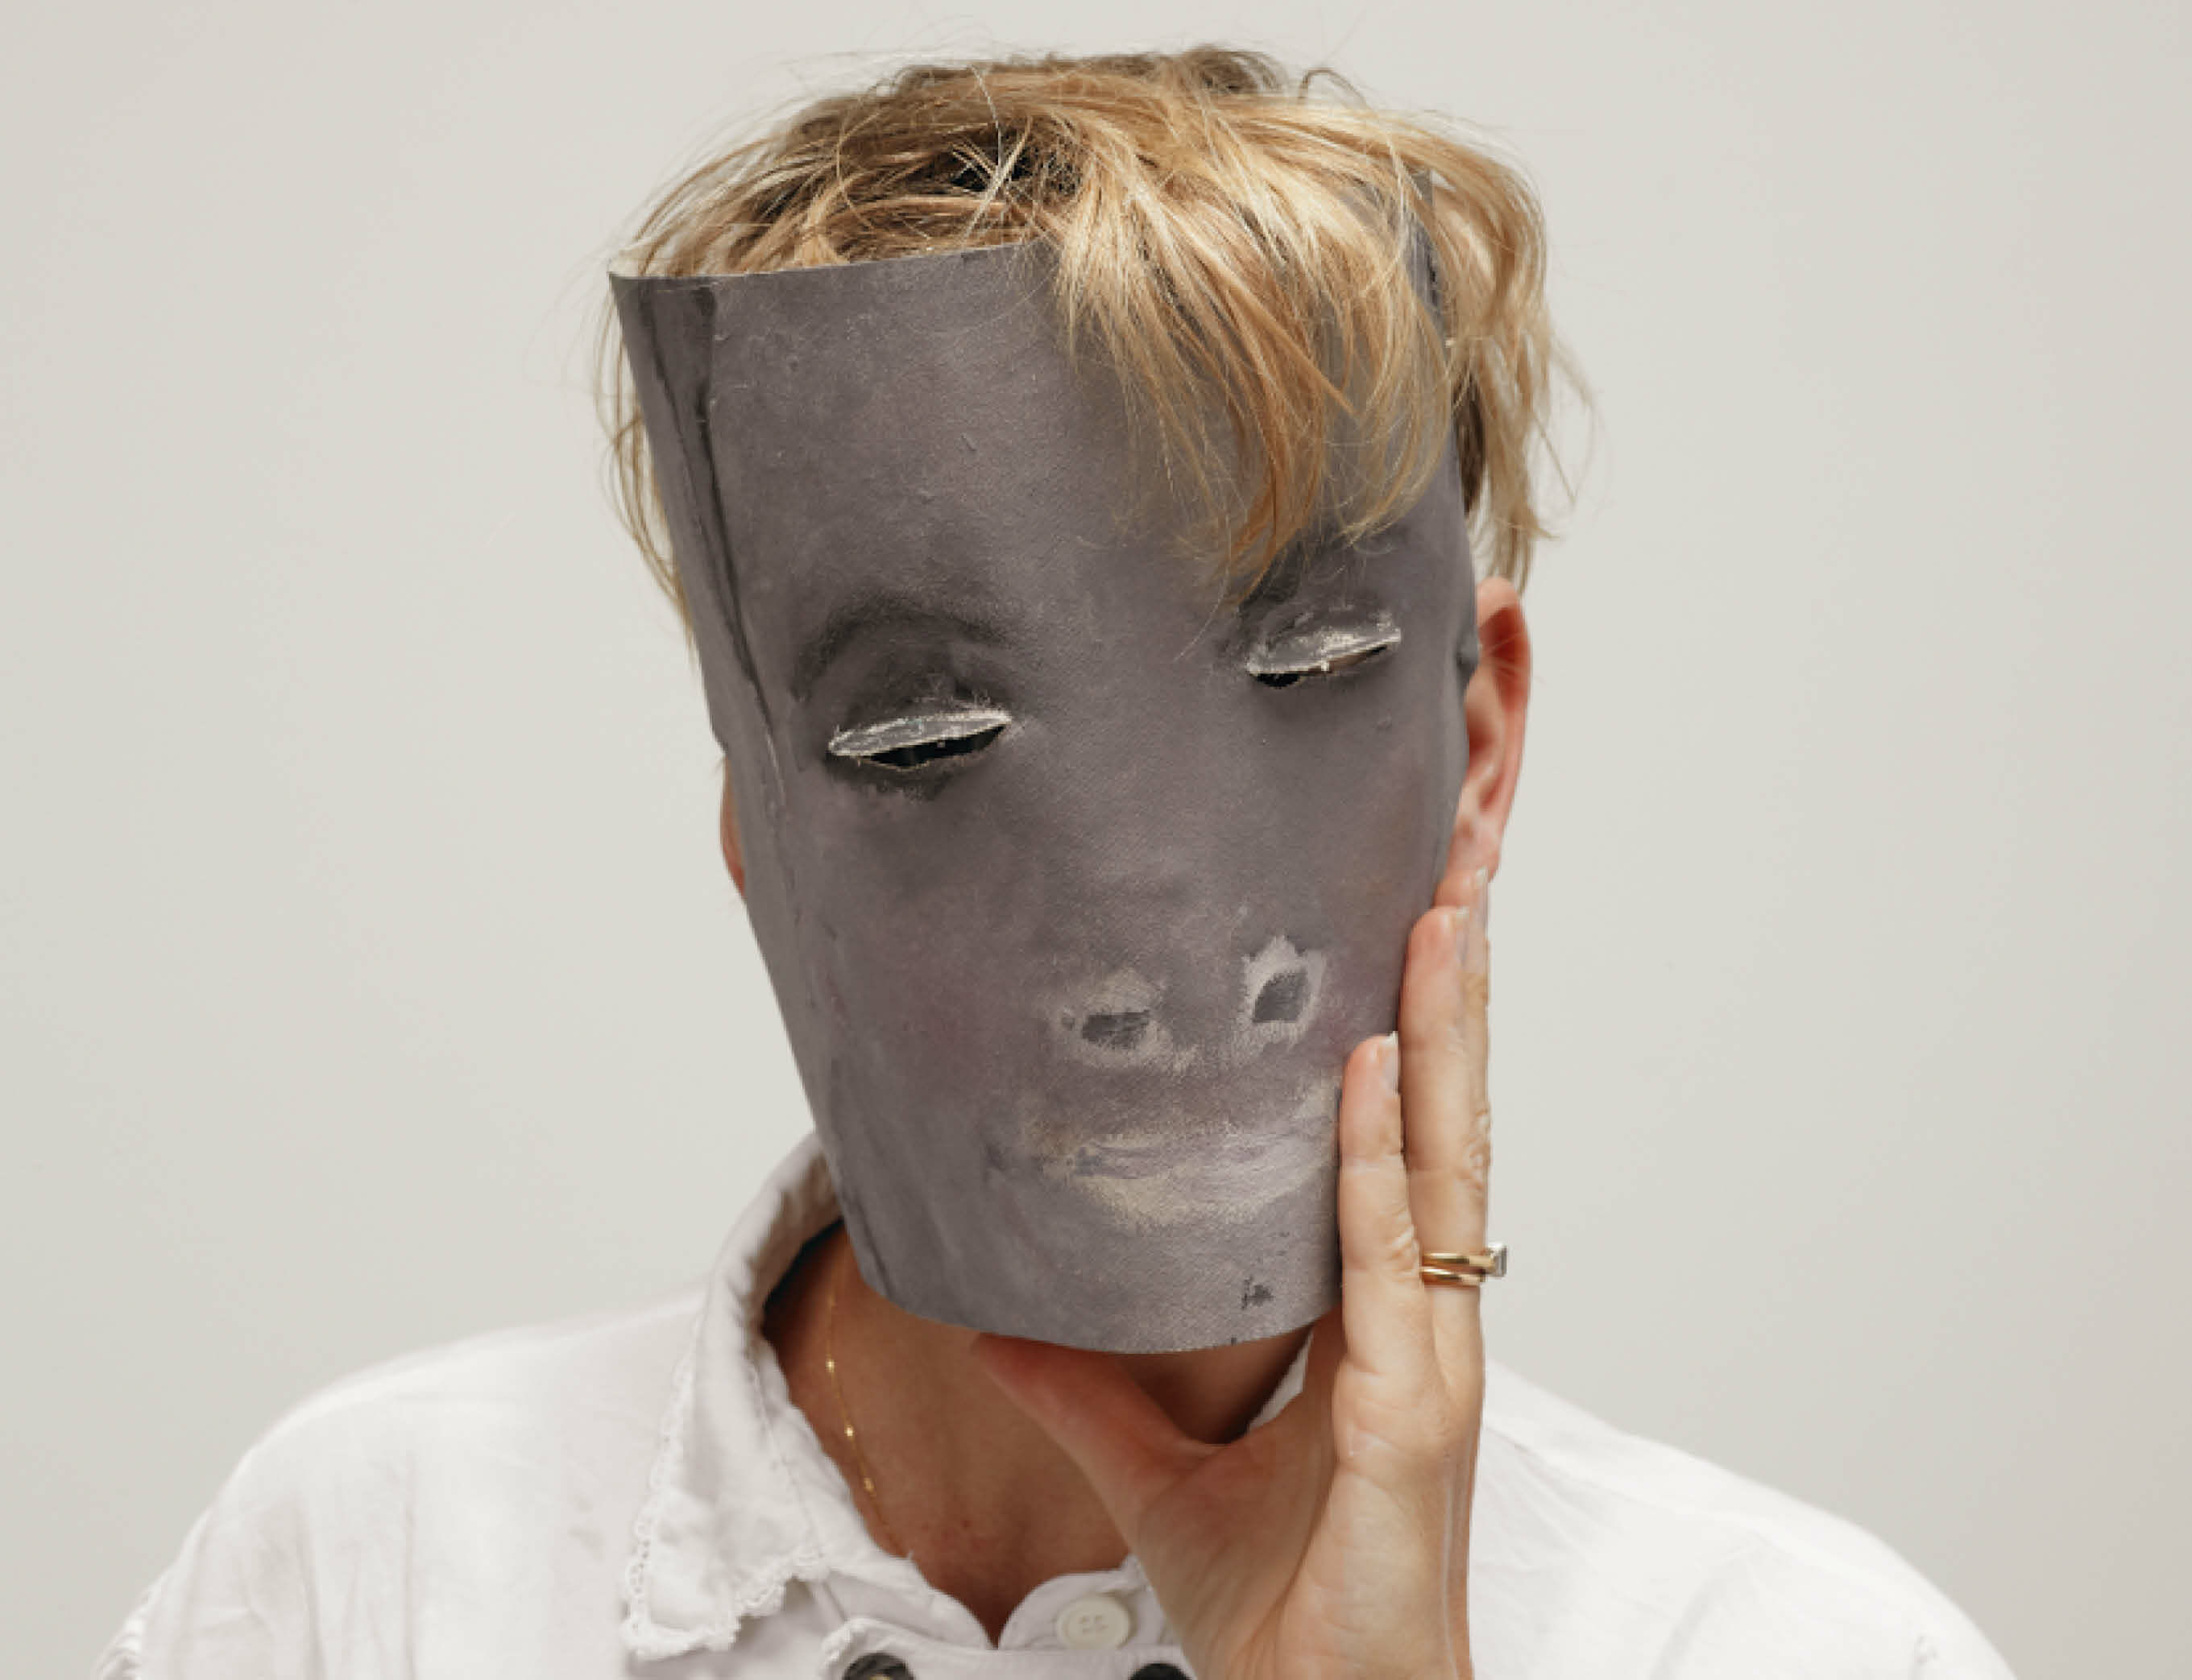 Lisson Gallery announces representation of Laure Prouvost